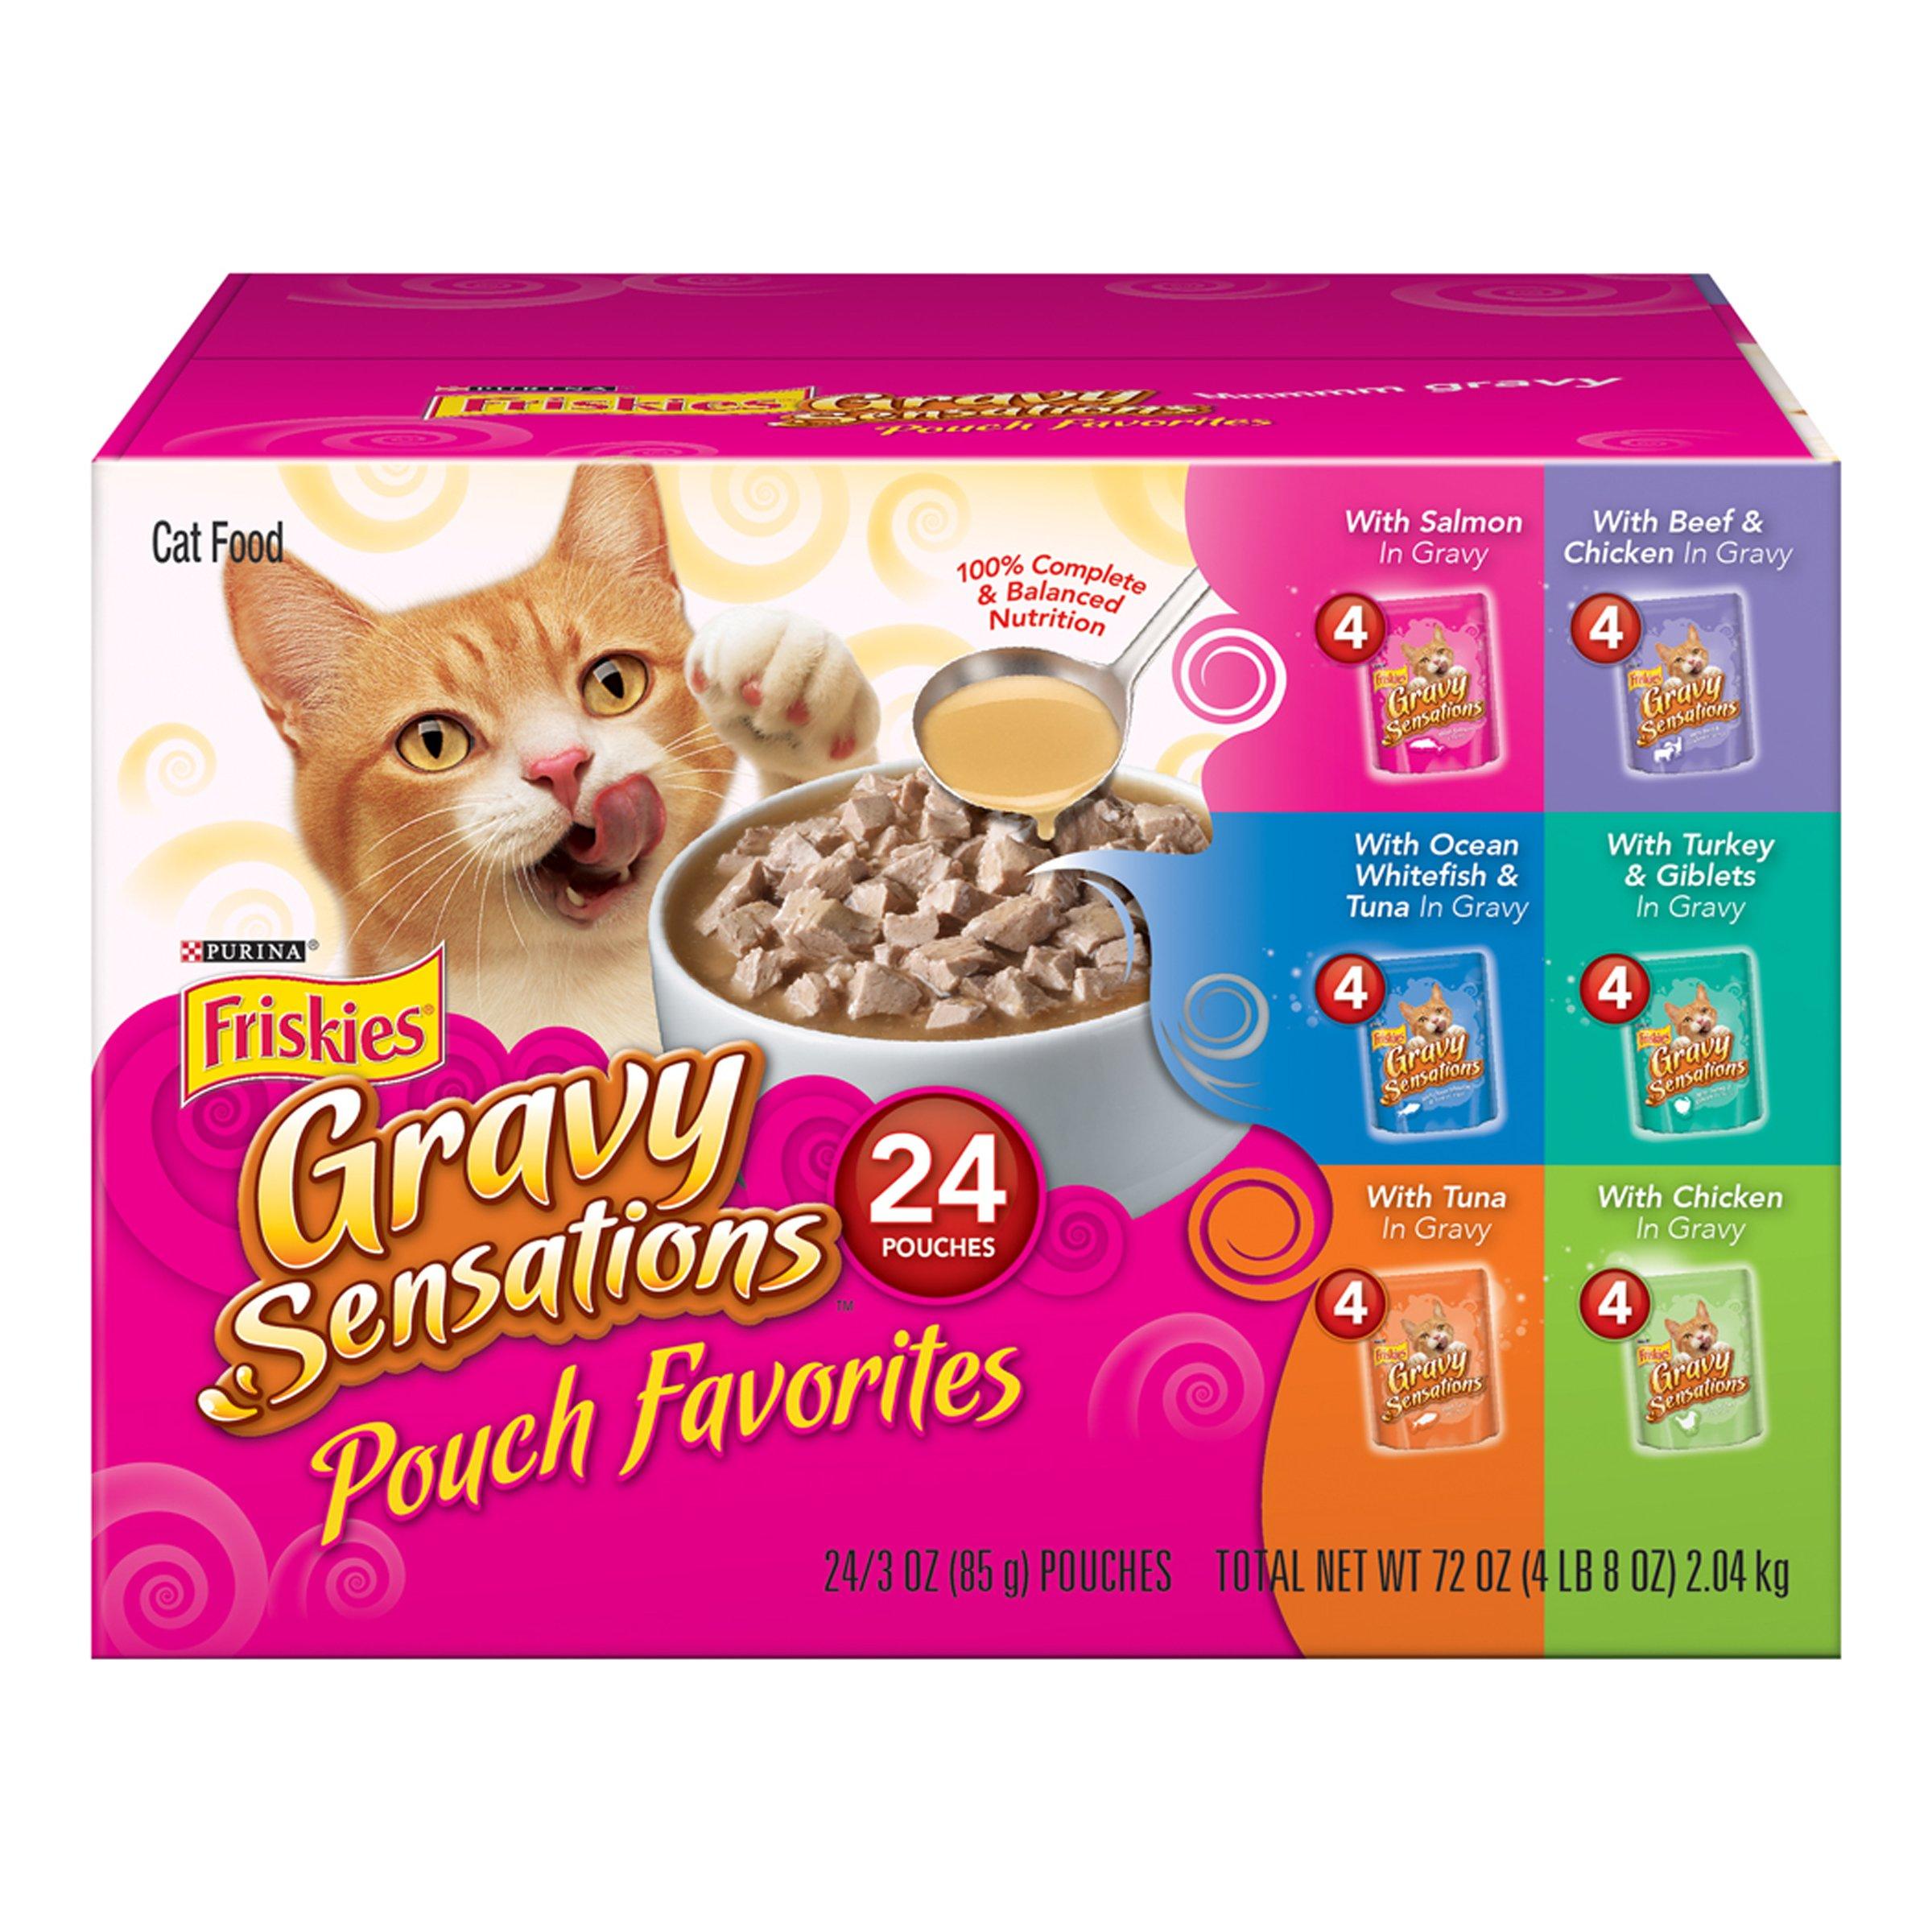 Purina Friskies Gravy Sensations Pouch Favorites Variety Pack Cat Food - (24) 72 oz. Box